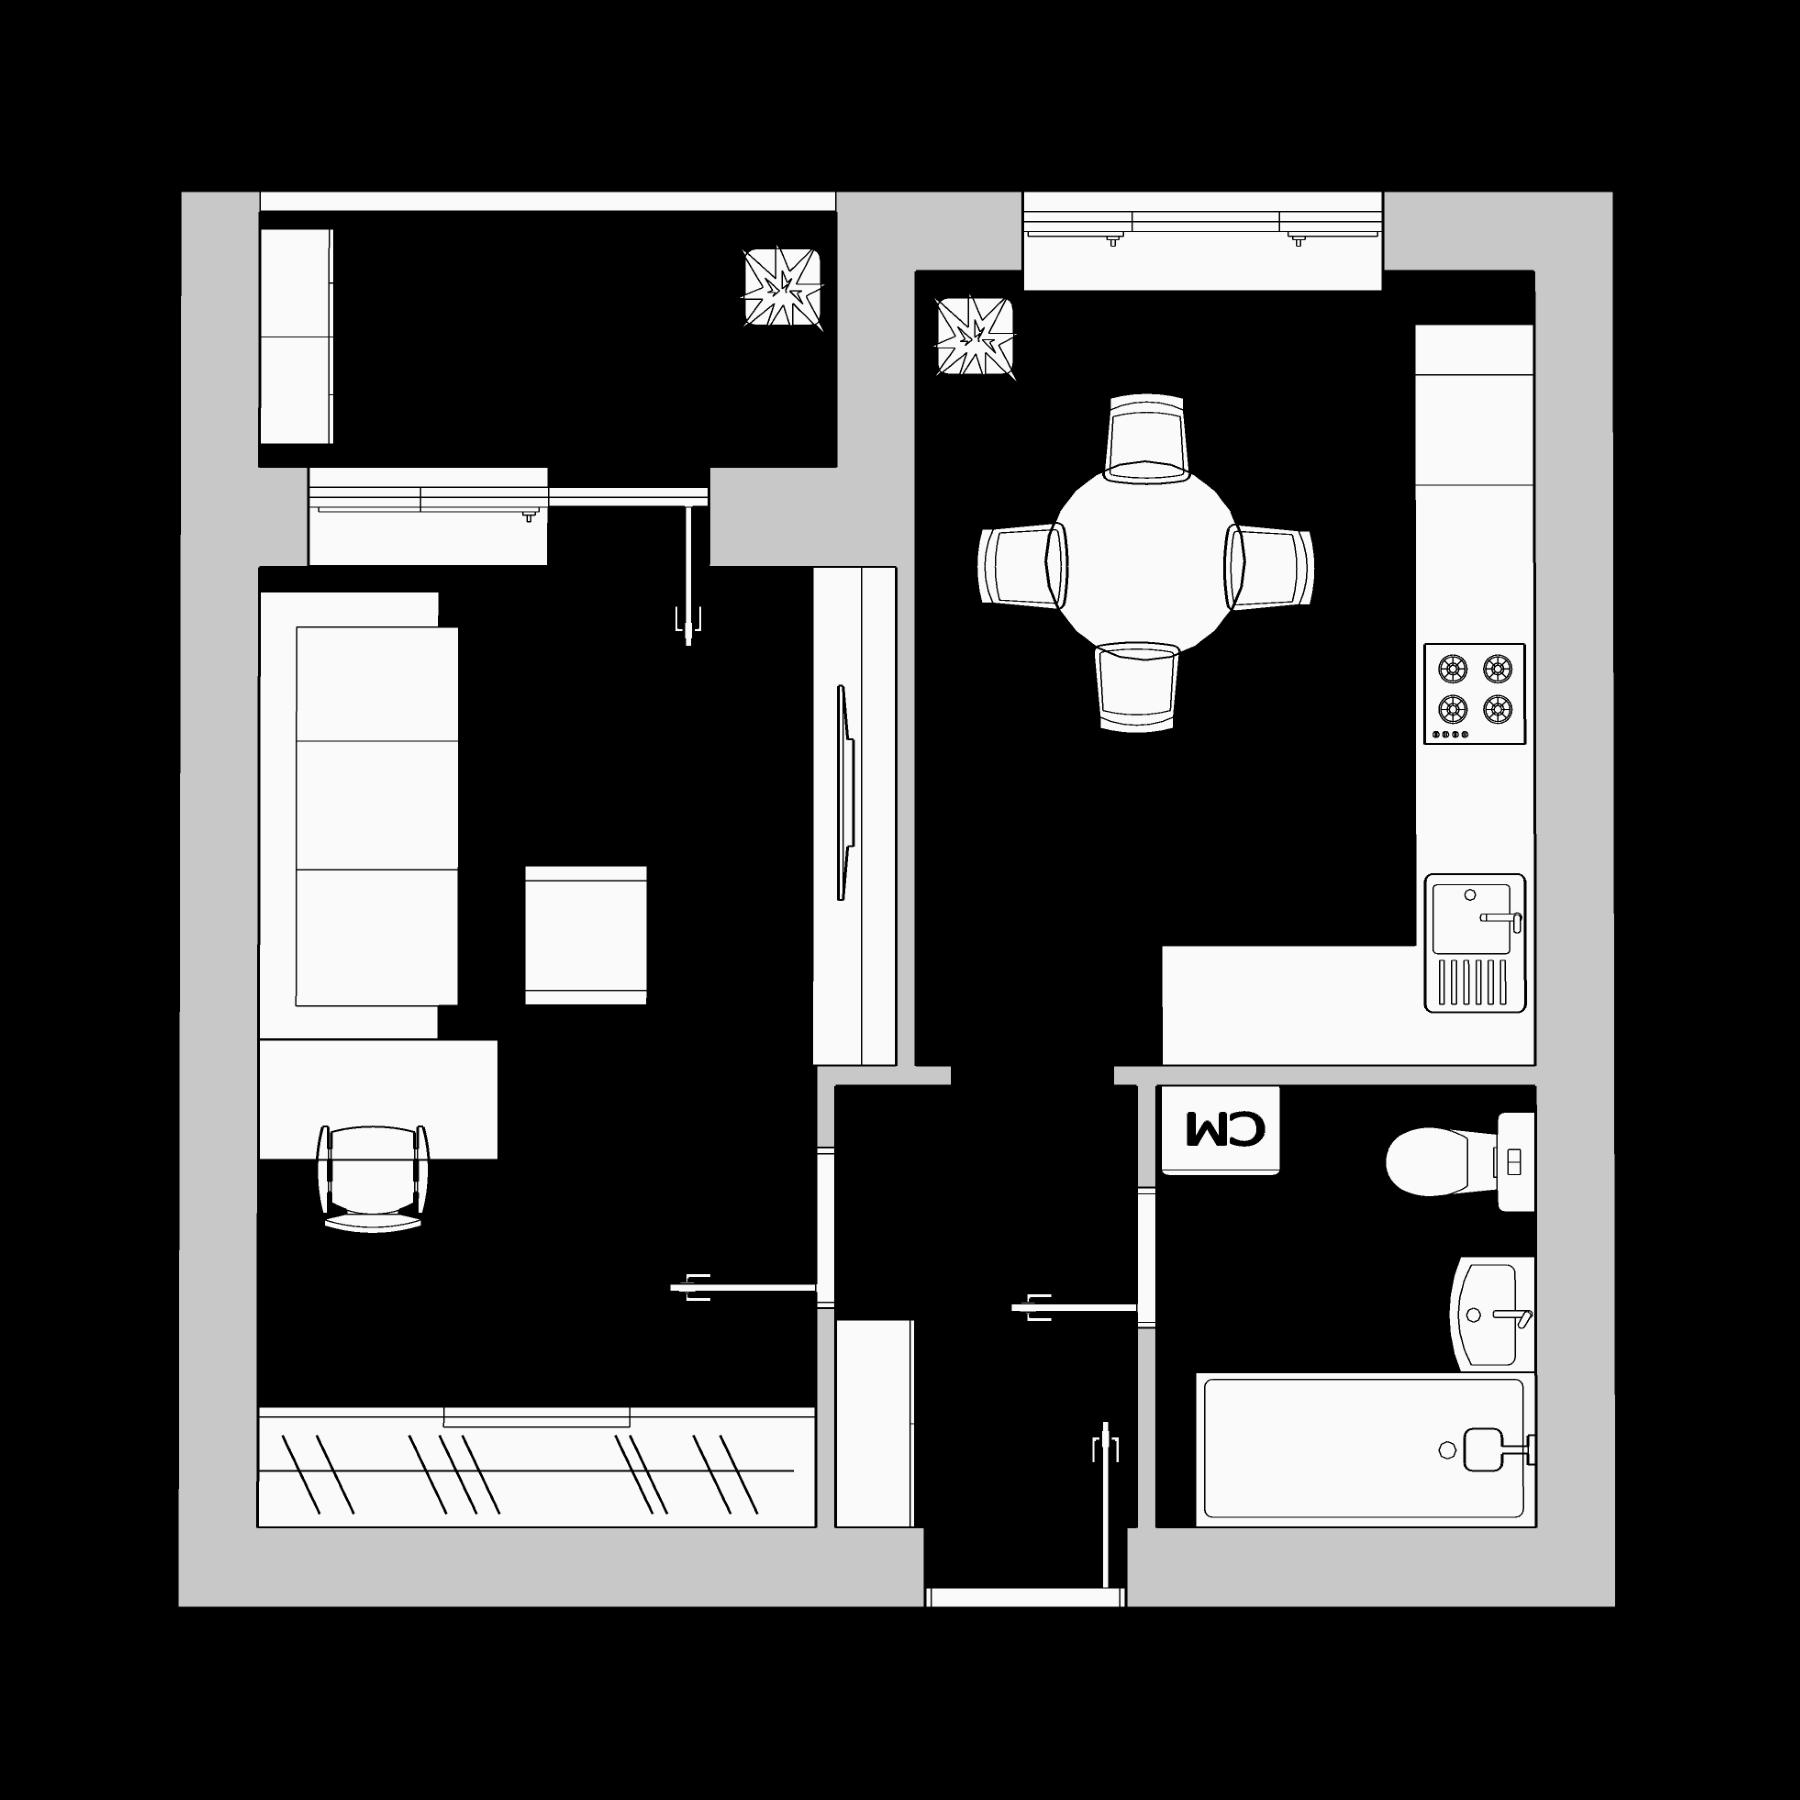 Однокомнатная квартира 35.78